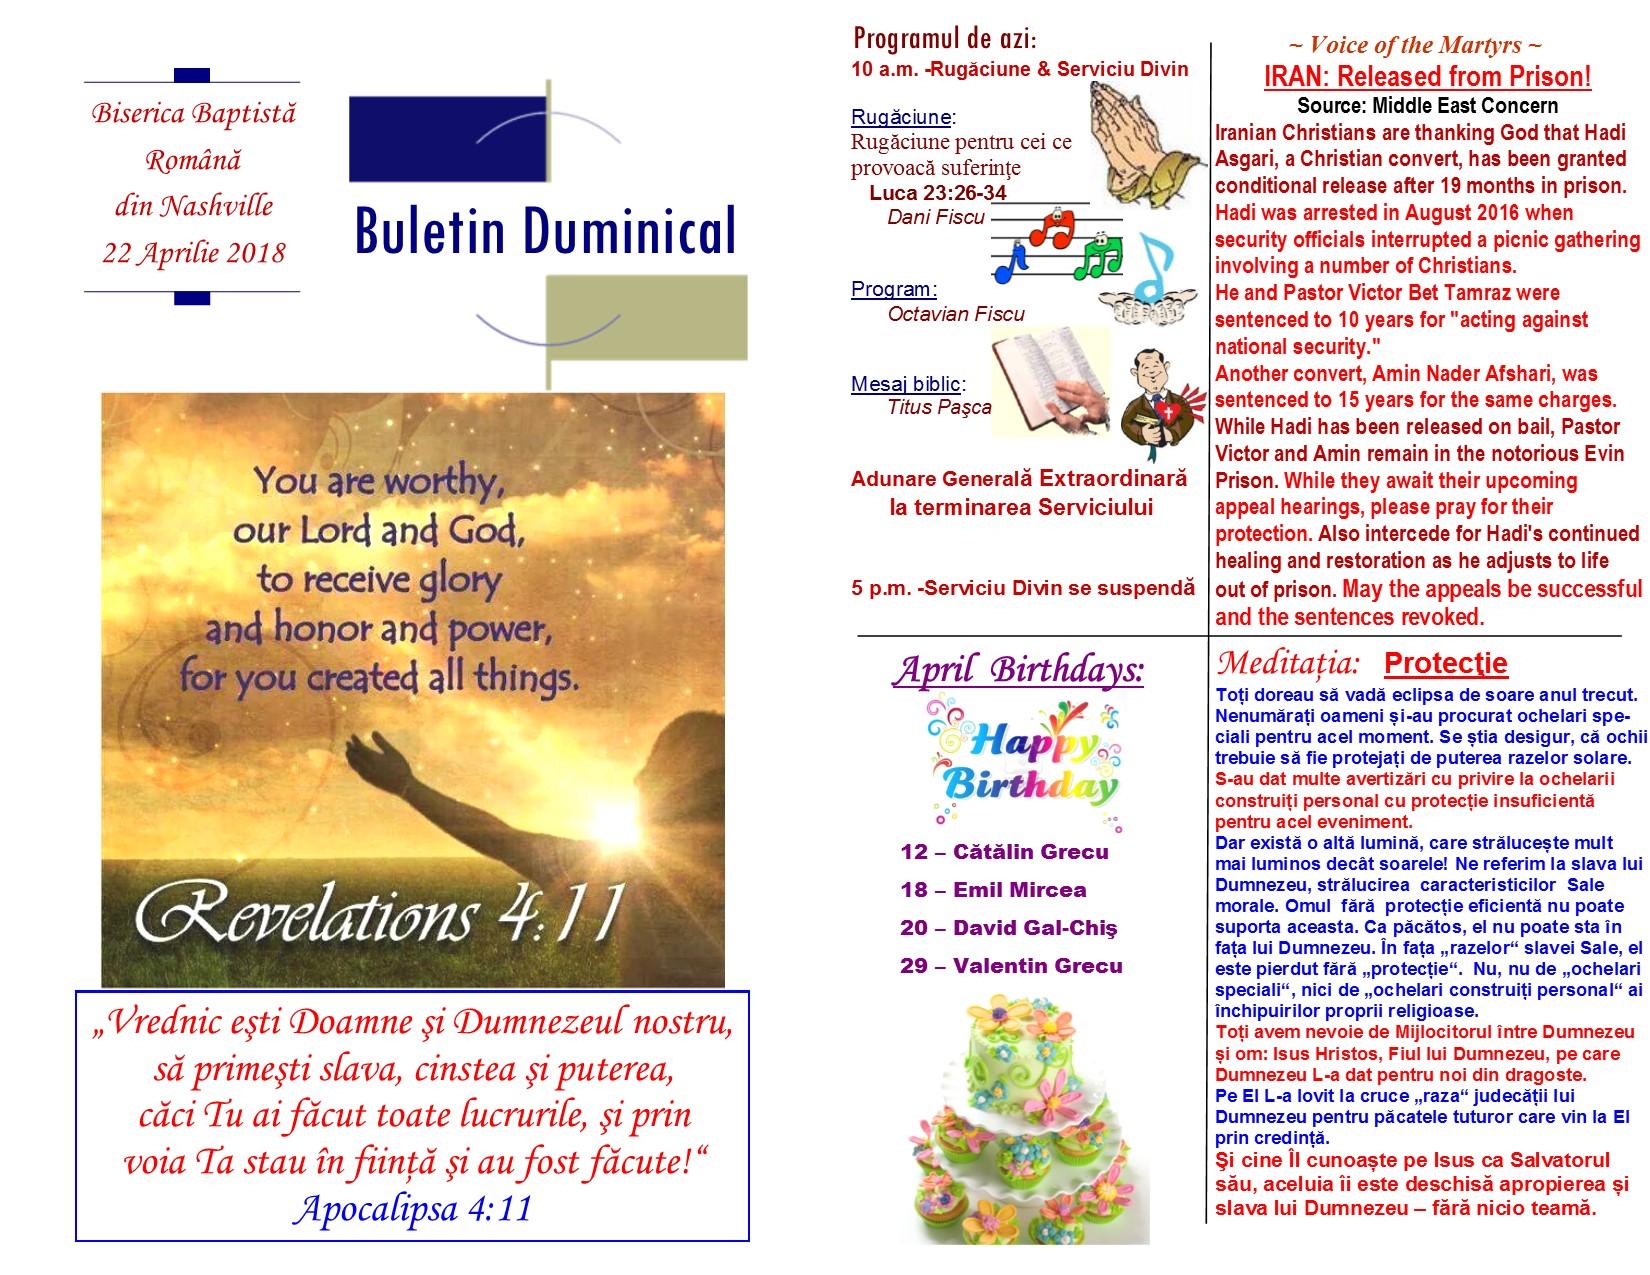 Buletin 04-22-18 page 1 & 2